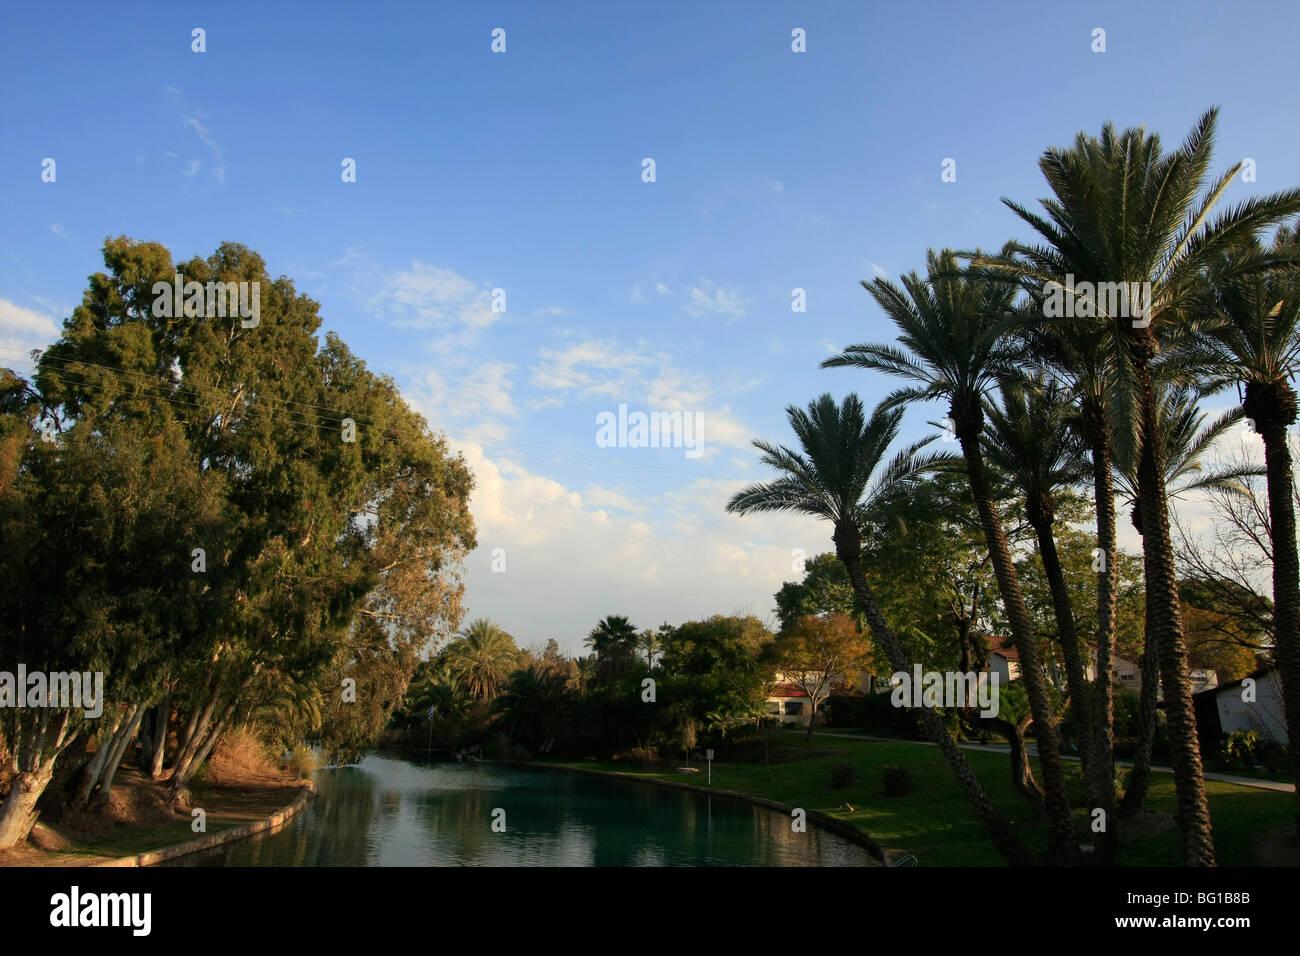 Israel, Beth Shean valley. Amal Strem in kibbutz Nir David - Stock Image